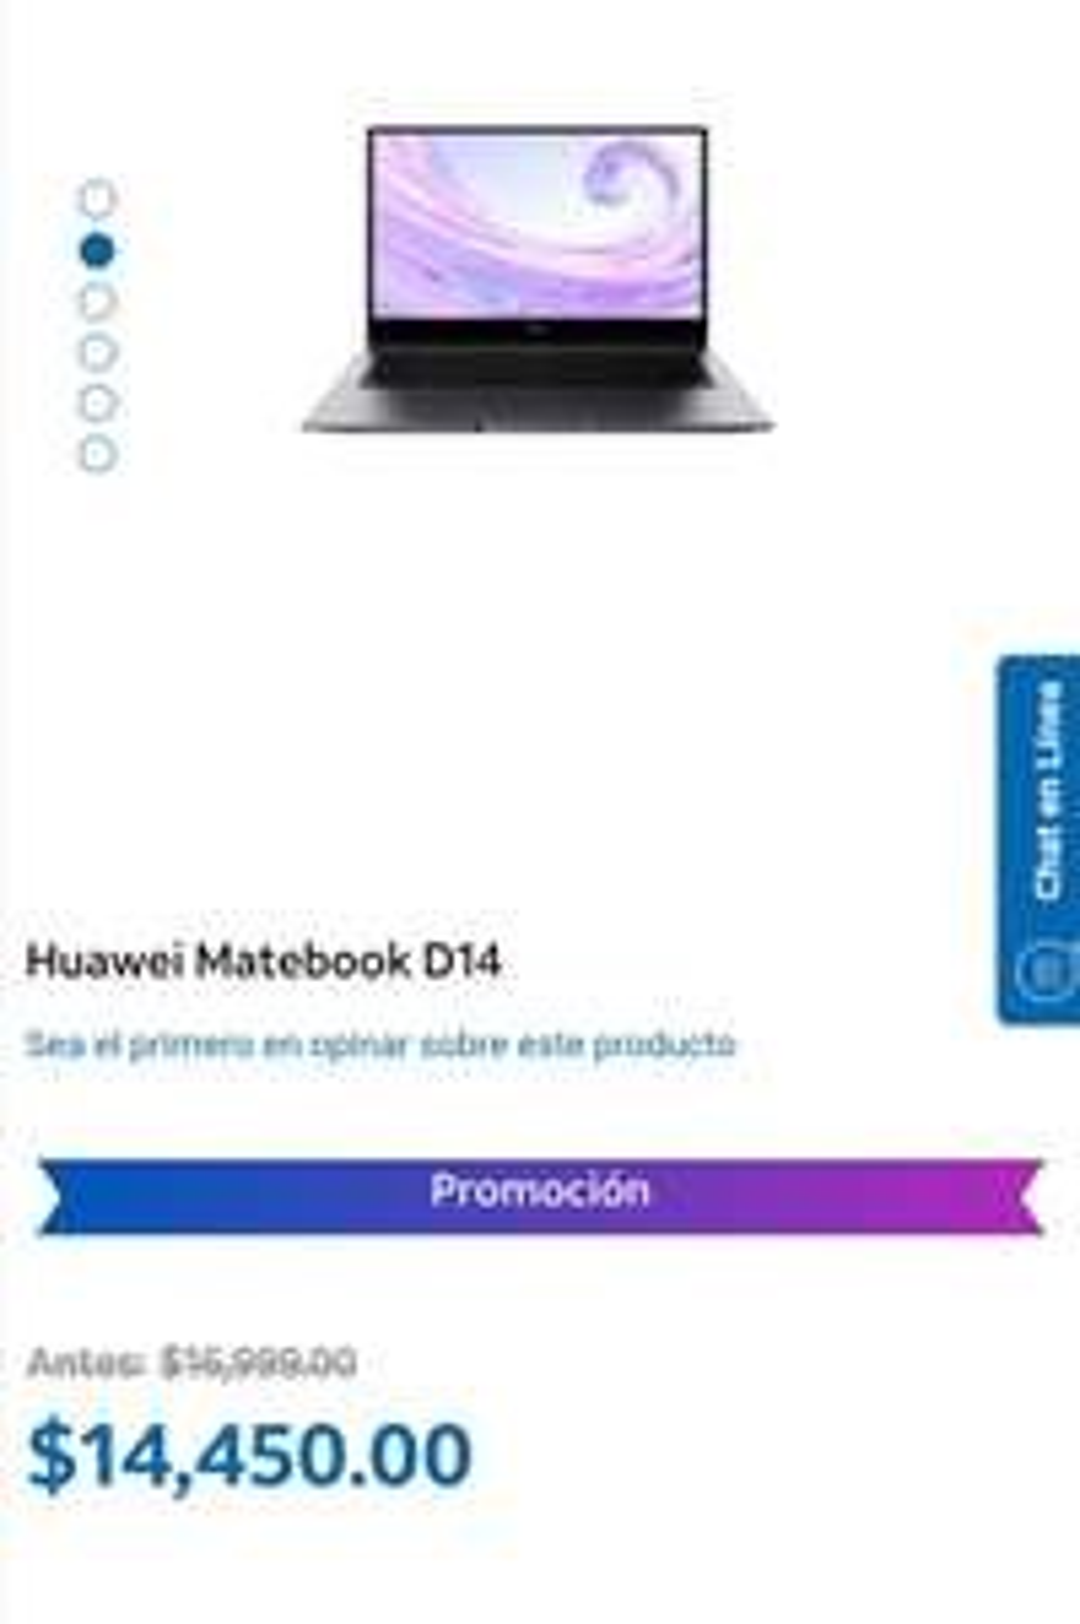 AT&T: Huawei Matebook D14